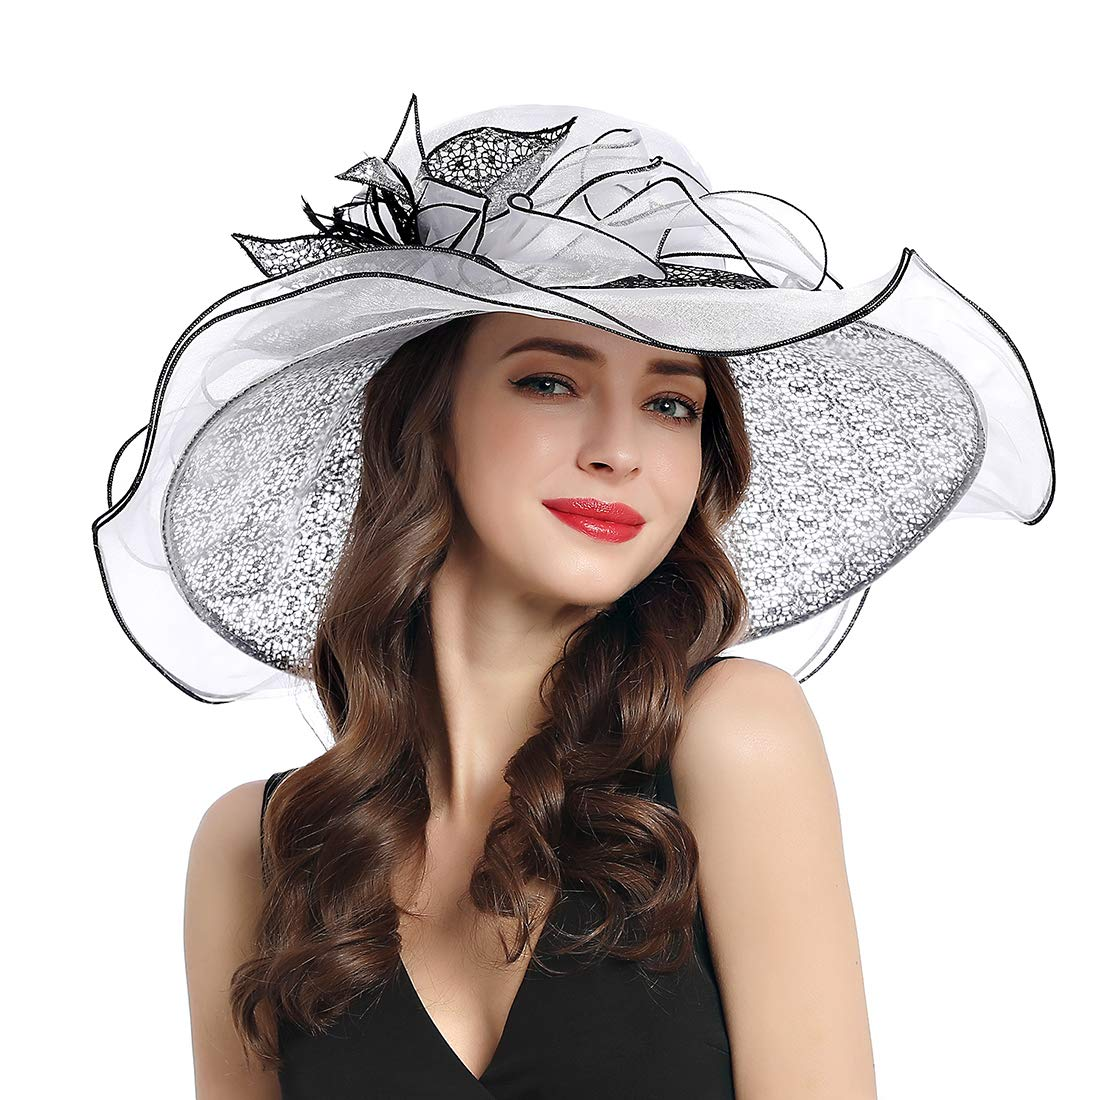 Women's Organza Church Kentucky Derby Fascinator Tea Party Wedding Hat (White Lace)